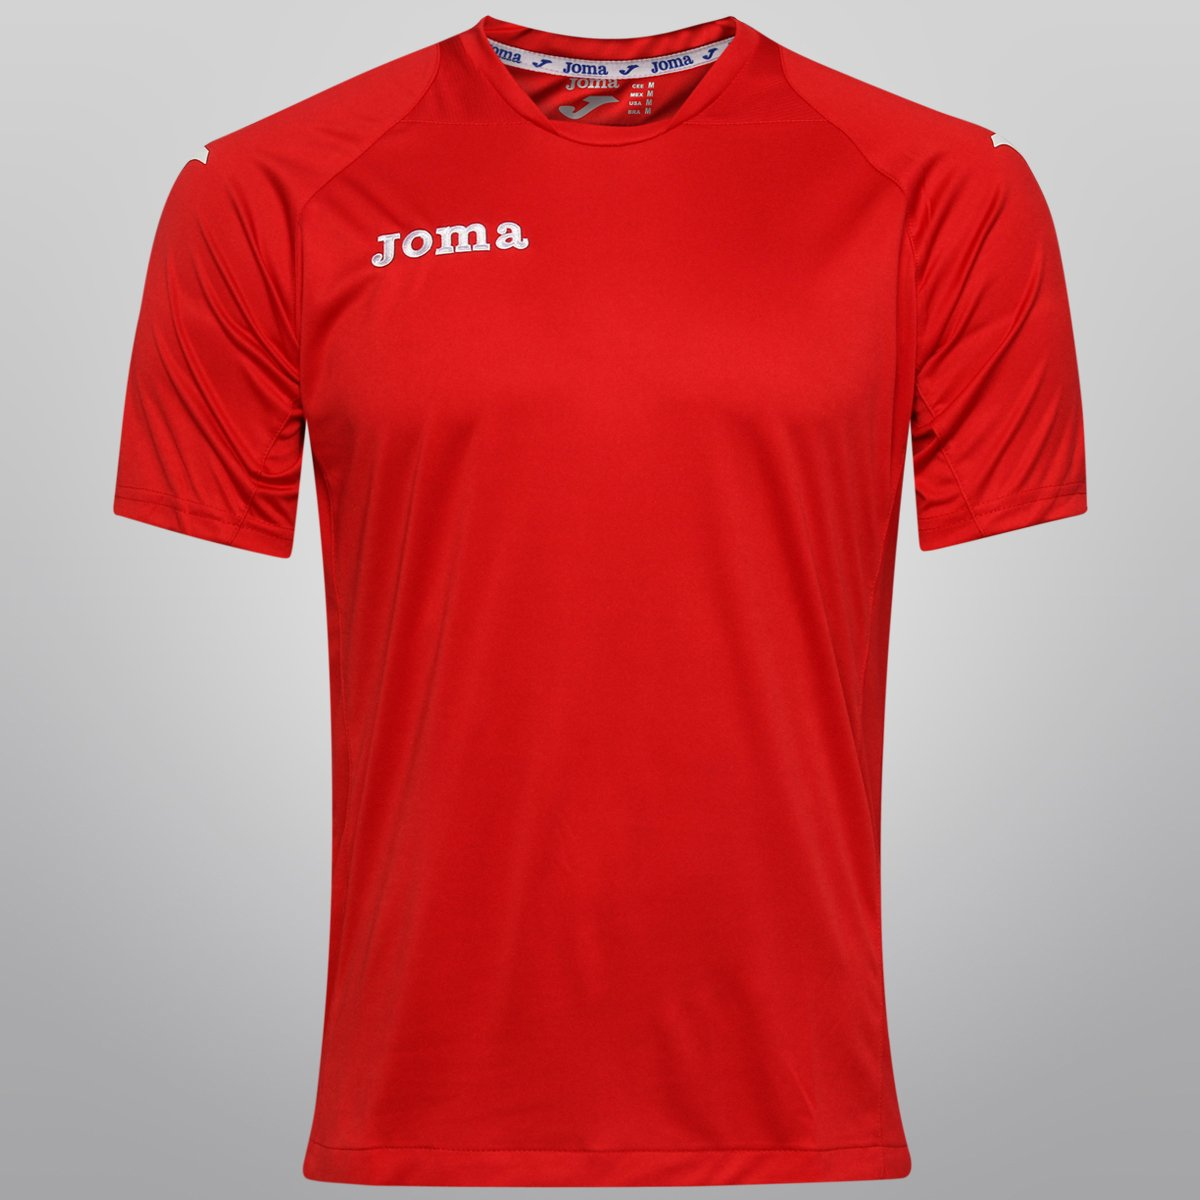 7c4857121d Camiseta Joma Fit One - Compre Agora